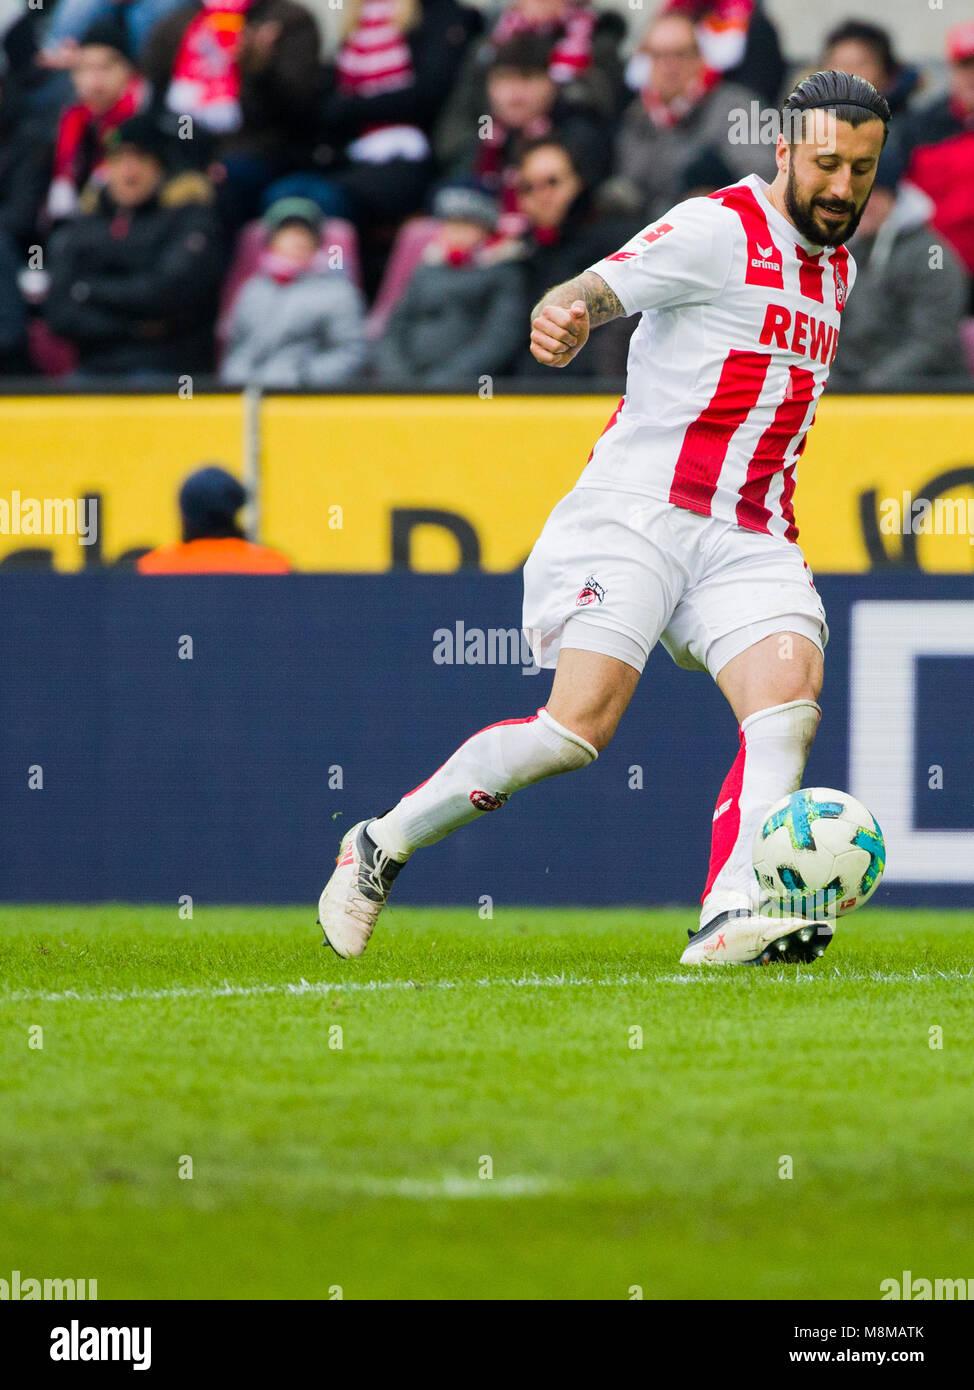 18 March 2018, Germany, Cologne: Soccer, 1. Bundesliga, 1. FC Cologne vs Bayer Leverkusen at the RheinEnergieStadion. - Stock Image